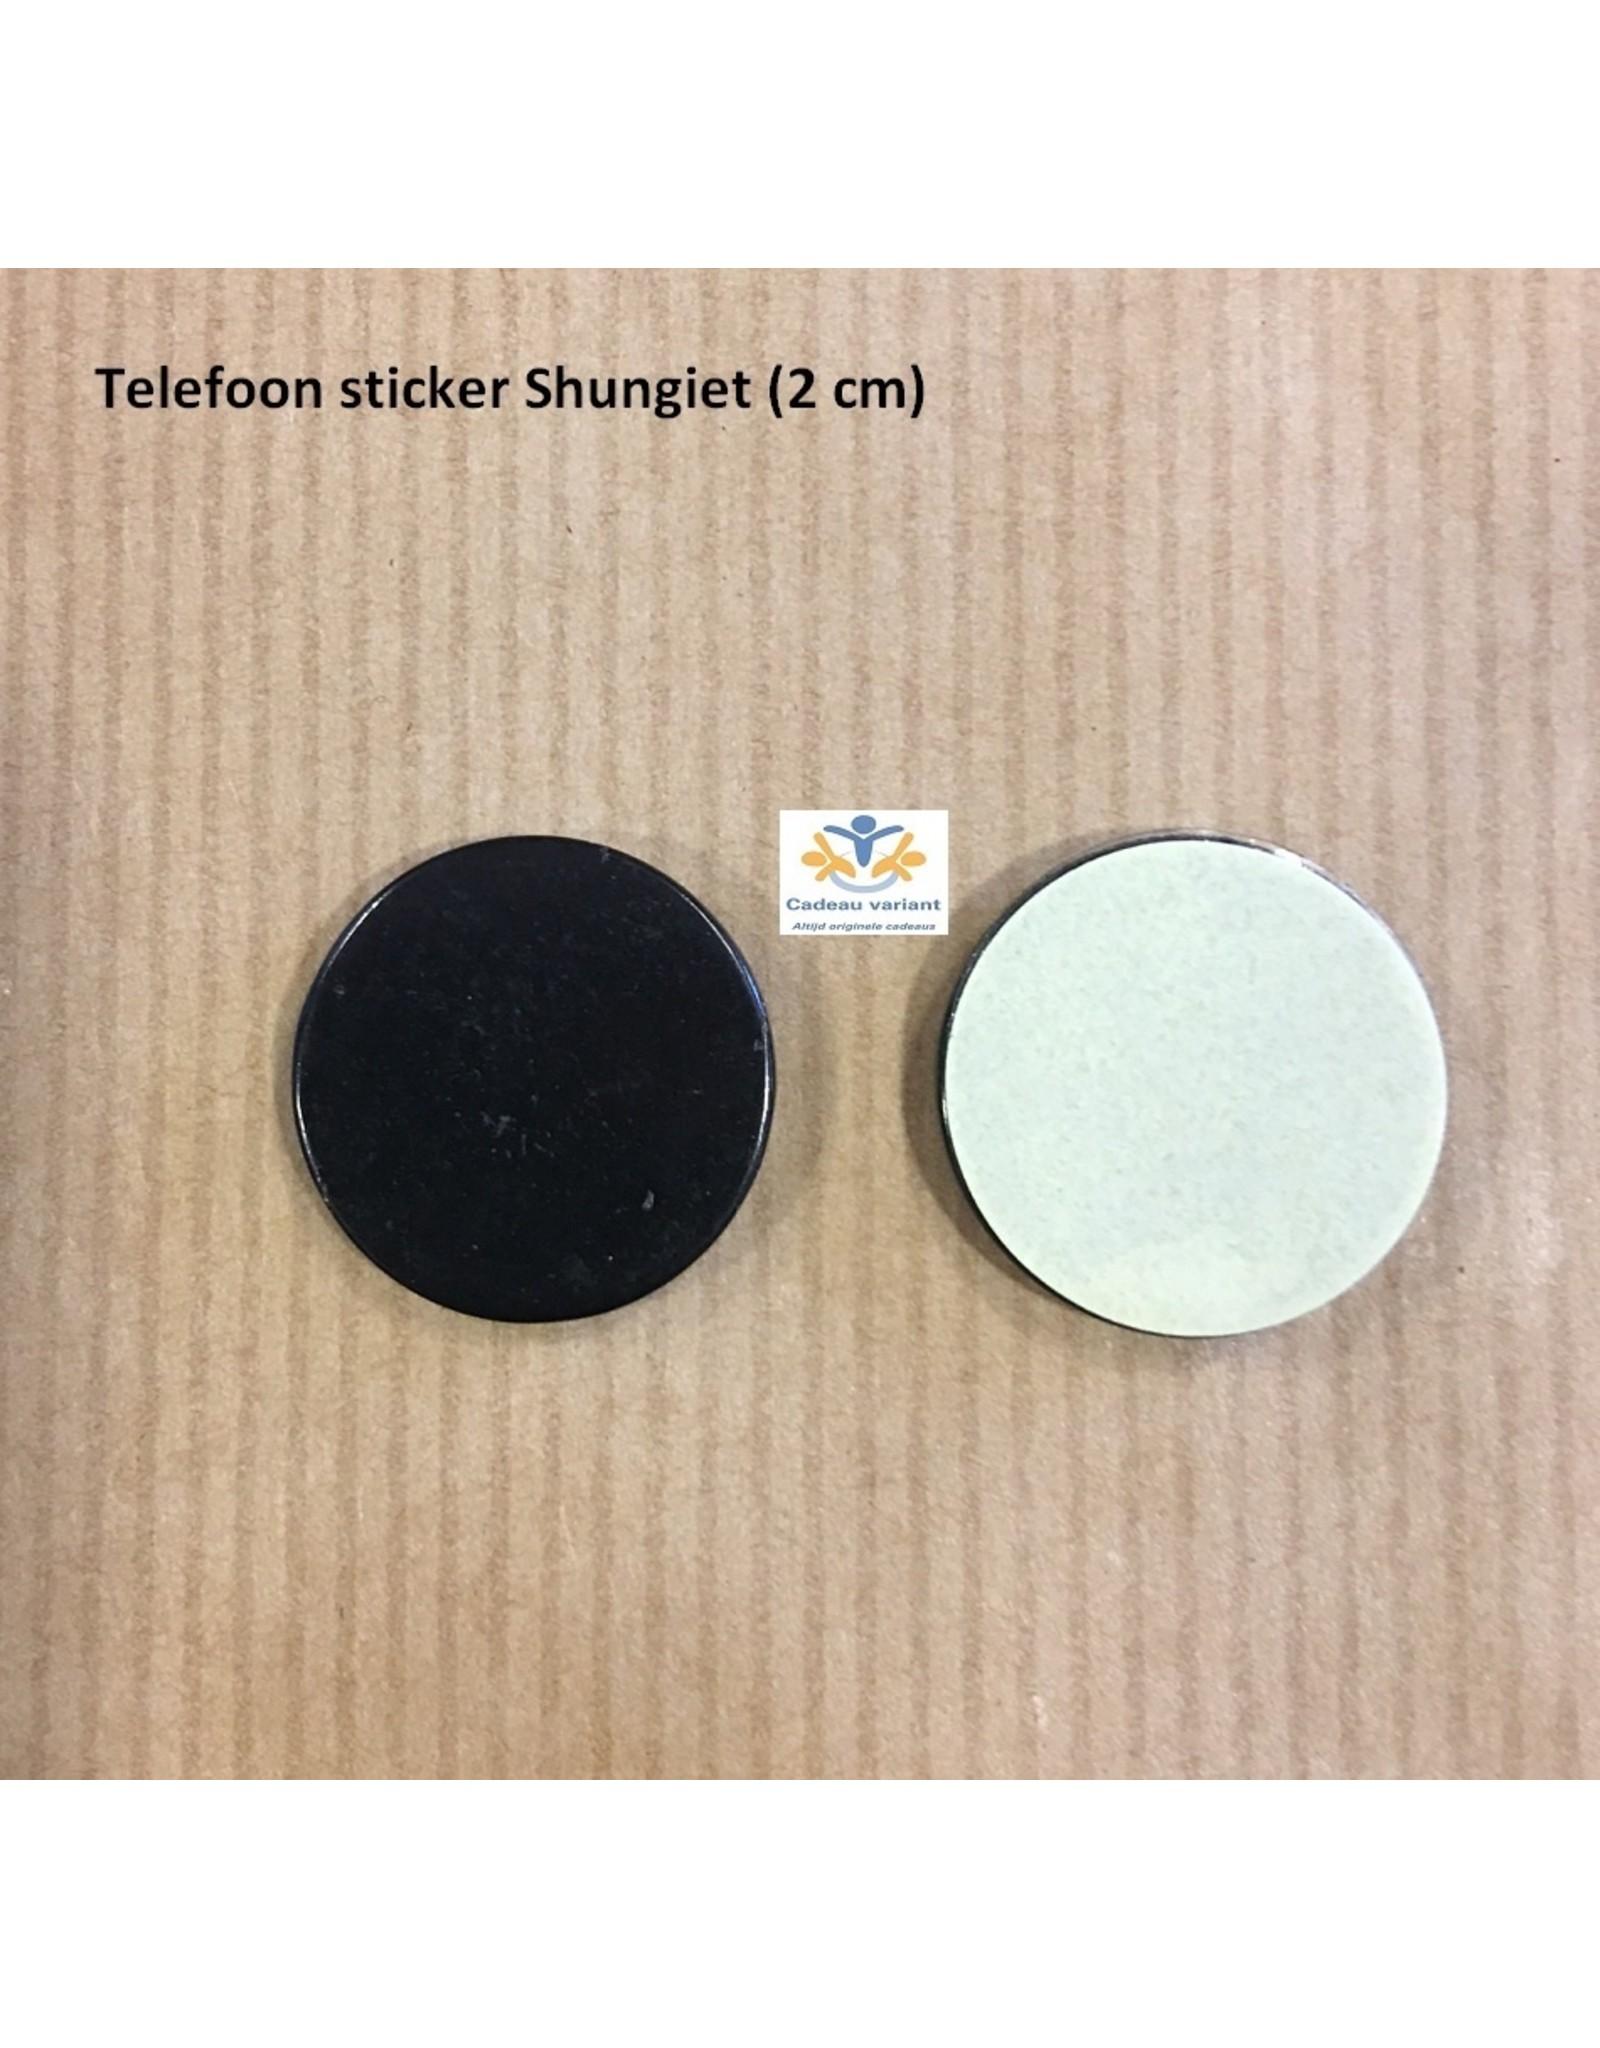 Telefoon sticker Shungiet